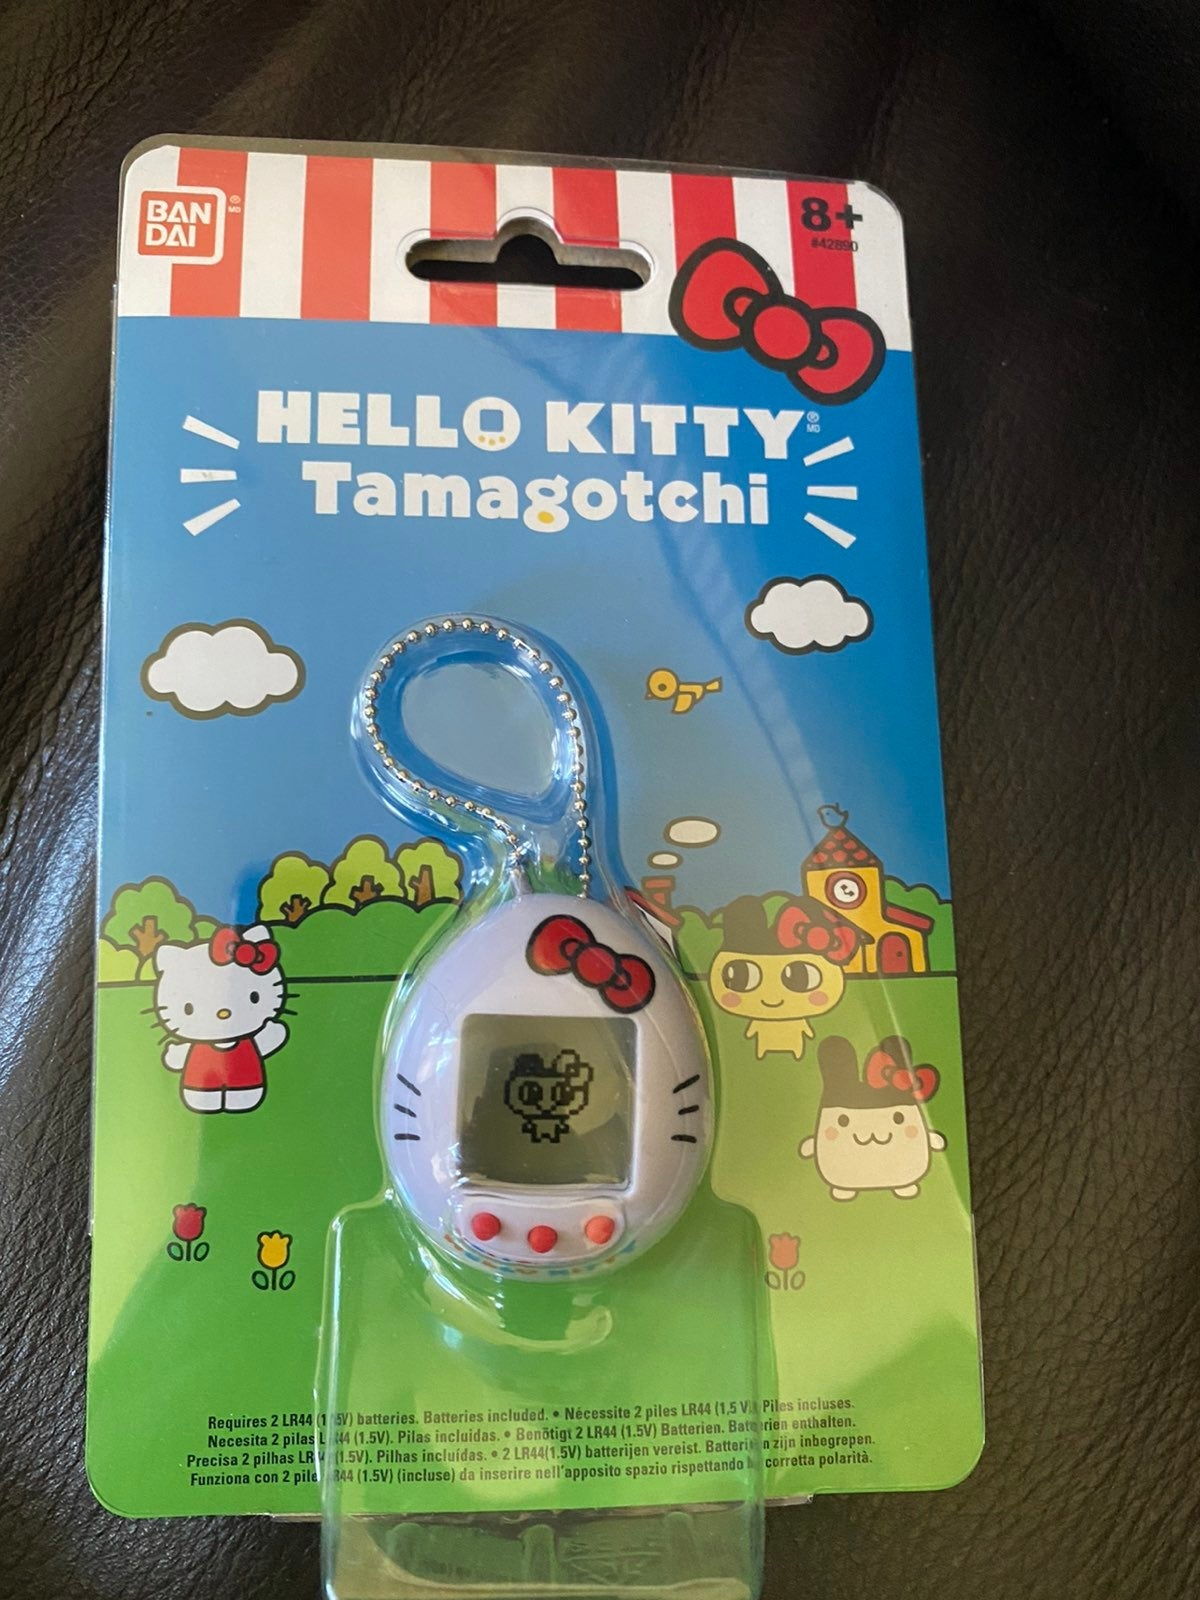 Hello Kitty Tamagotchi Keychain